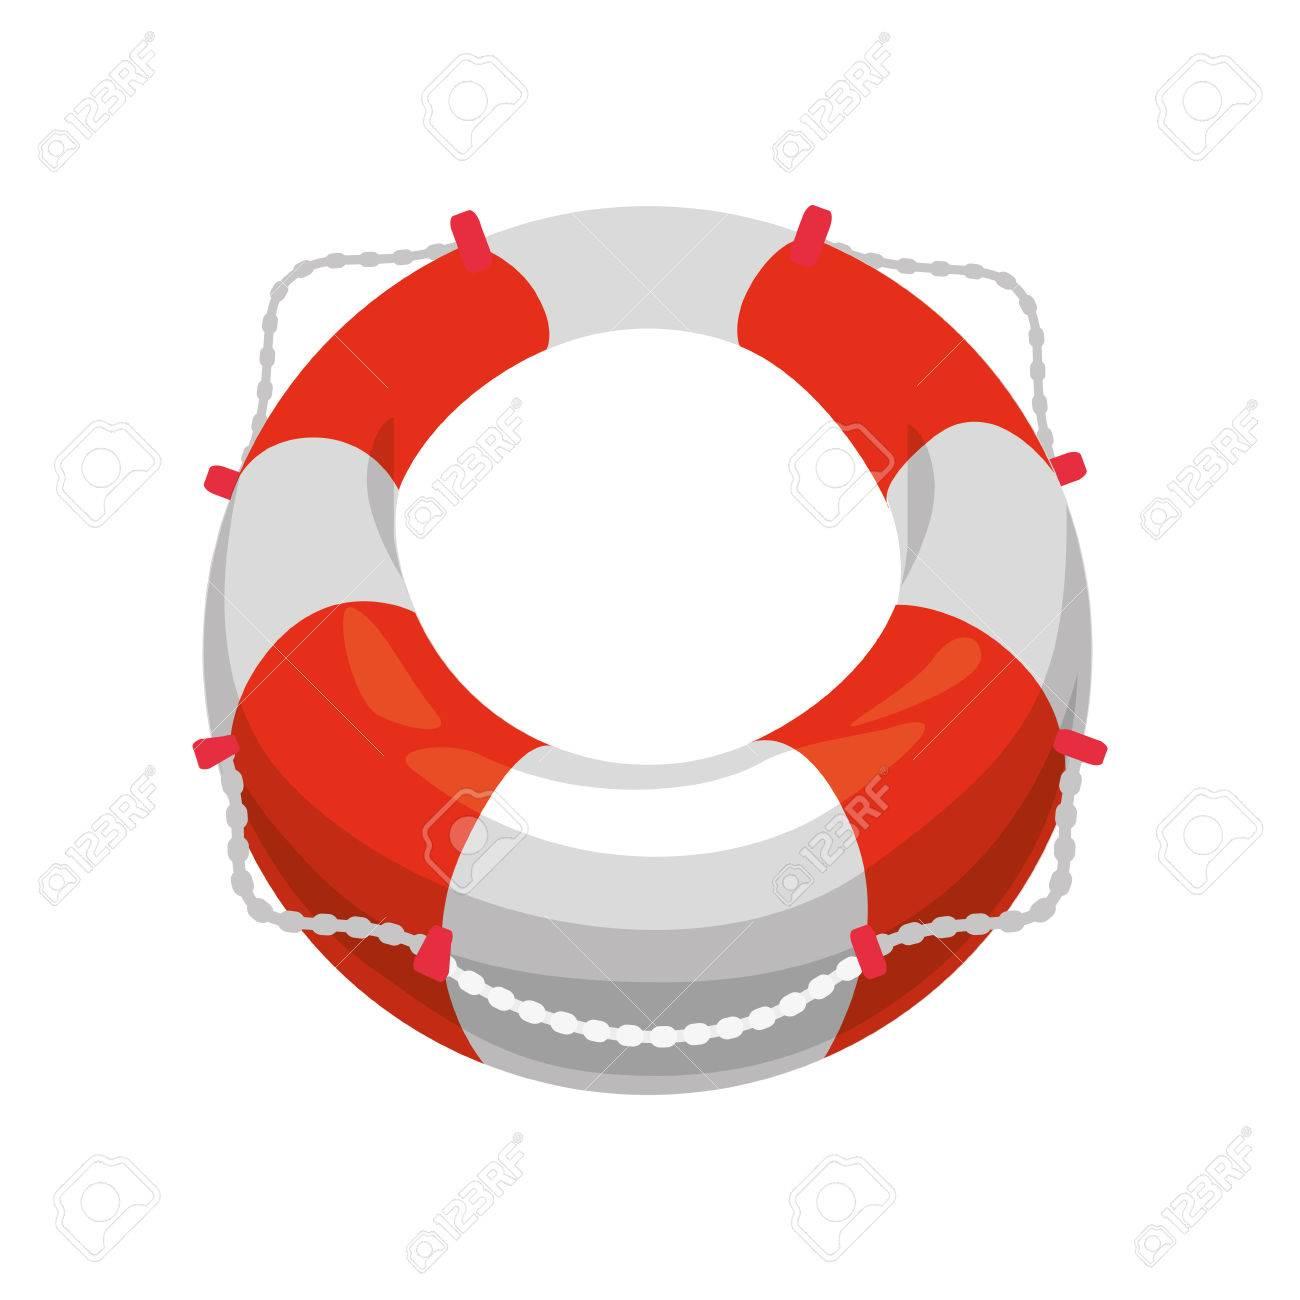 nautical life ring icon